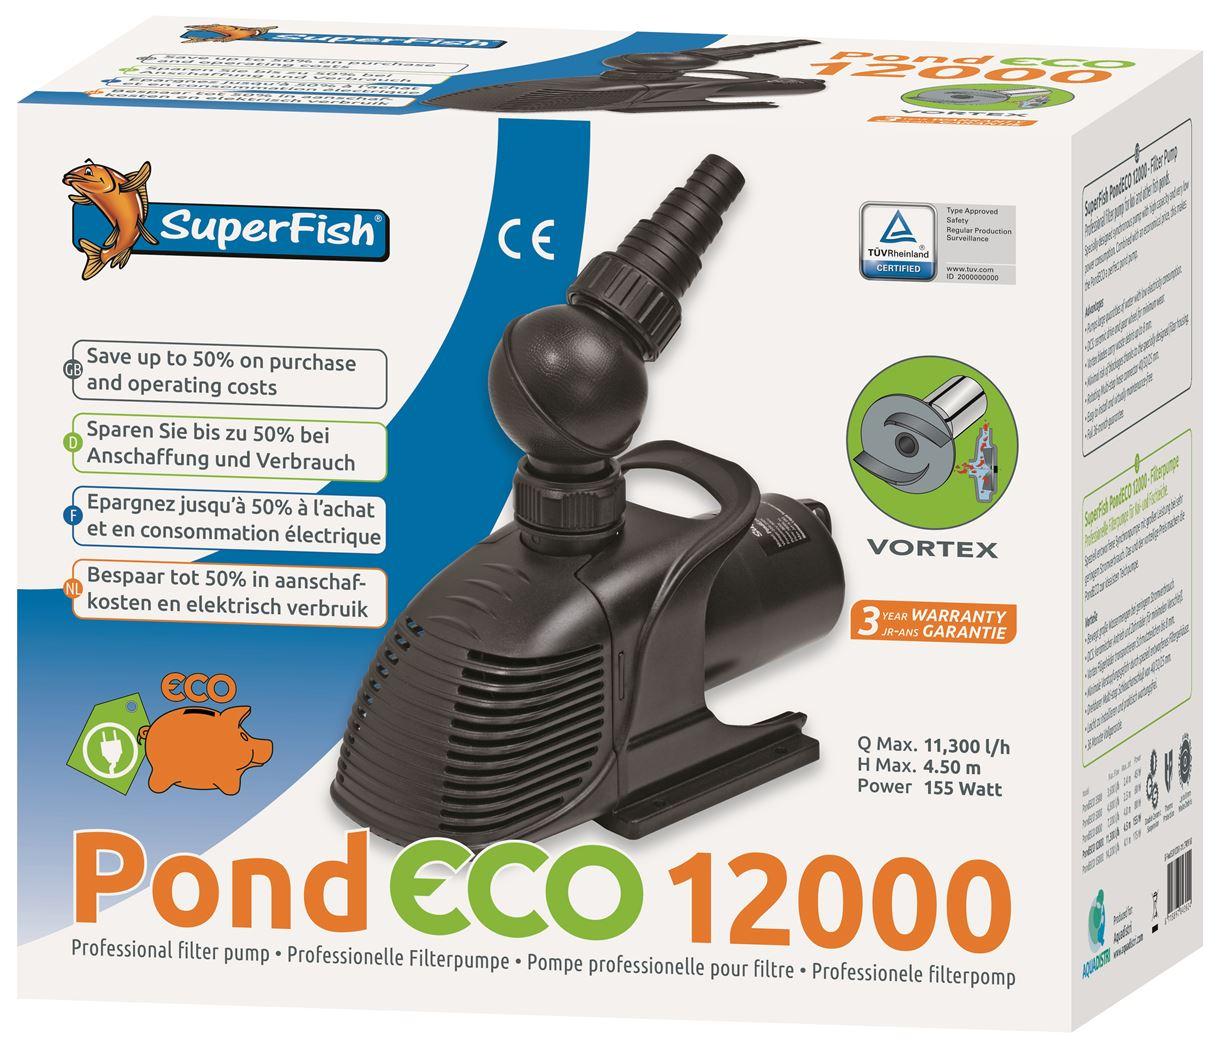 vijverpomp superfish pond eco 12000